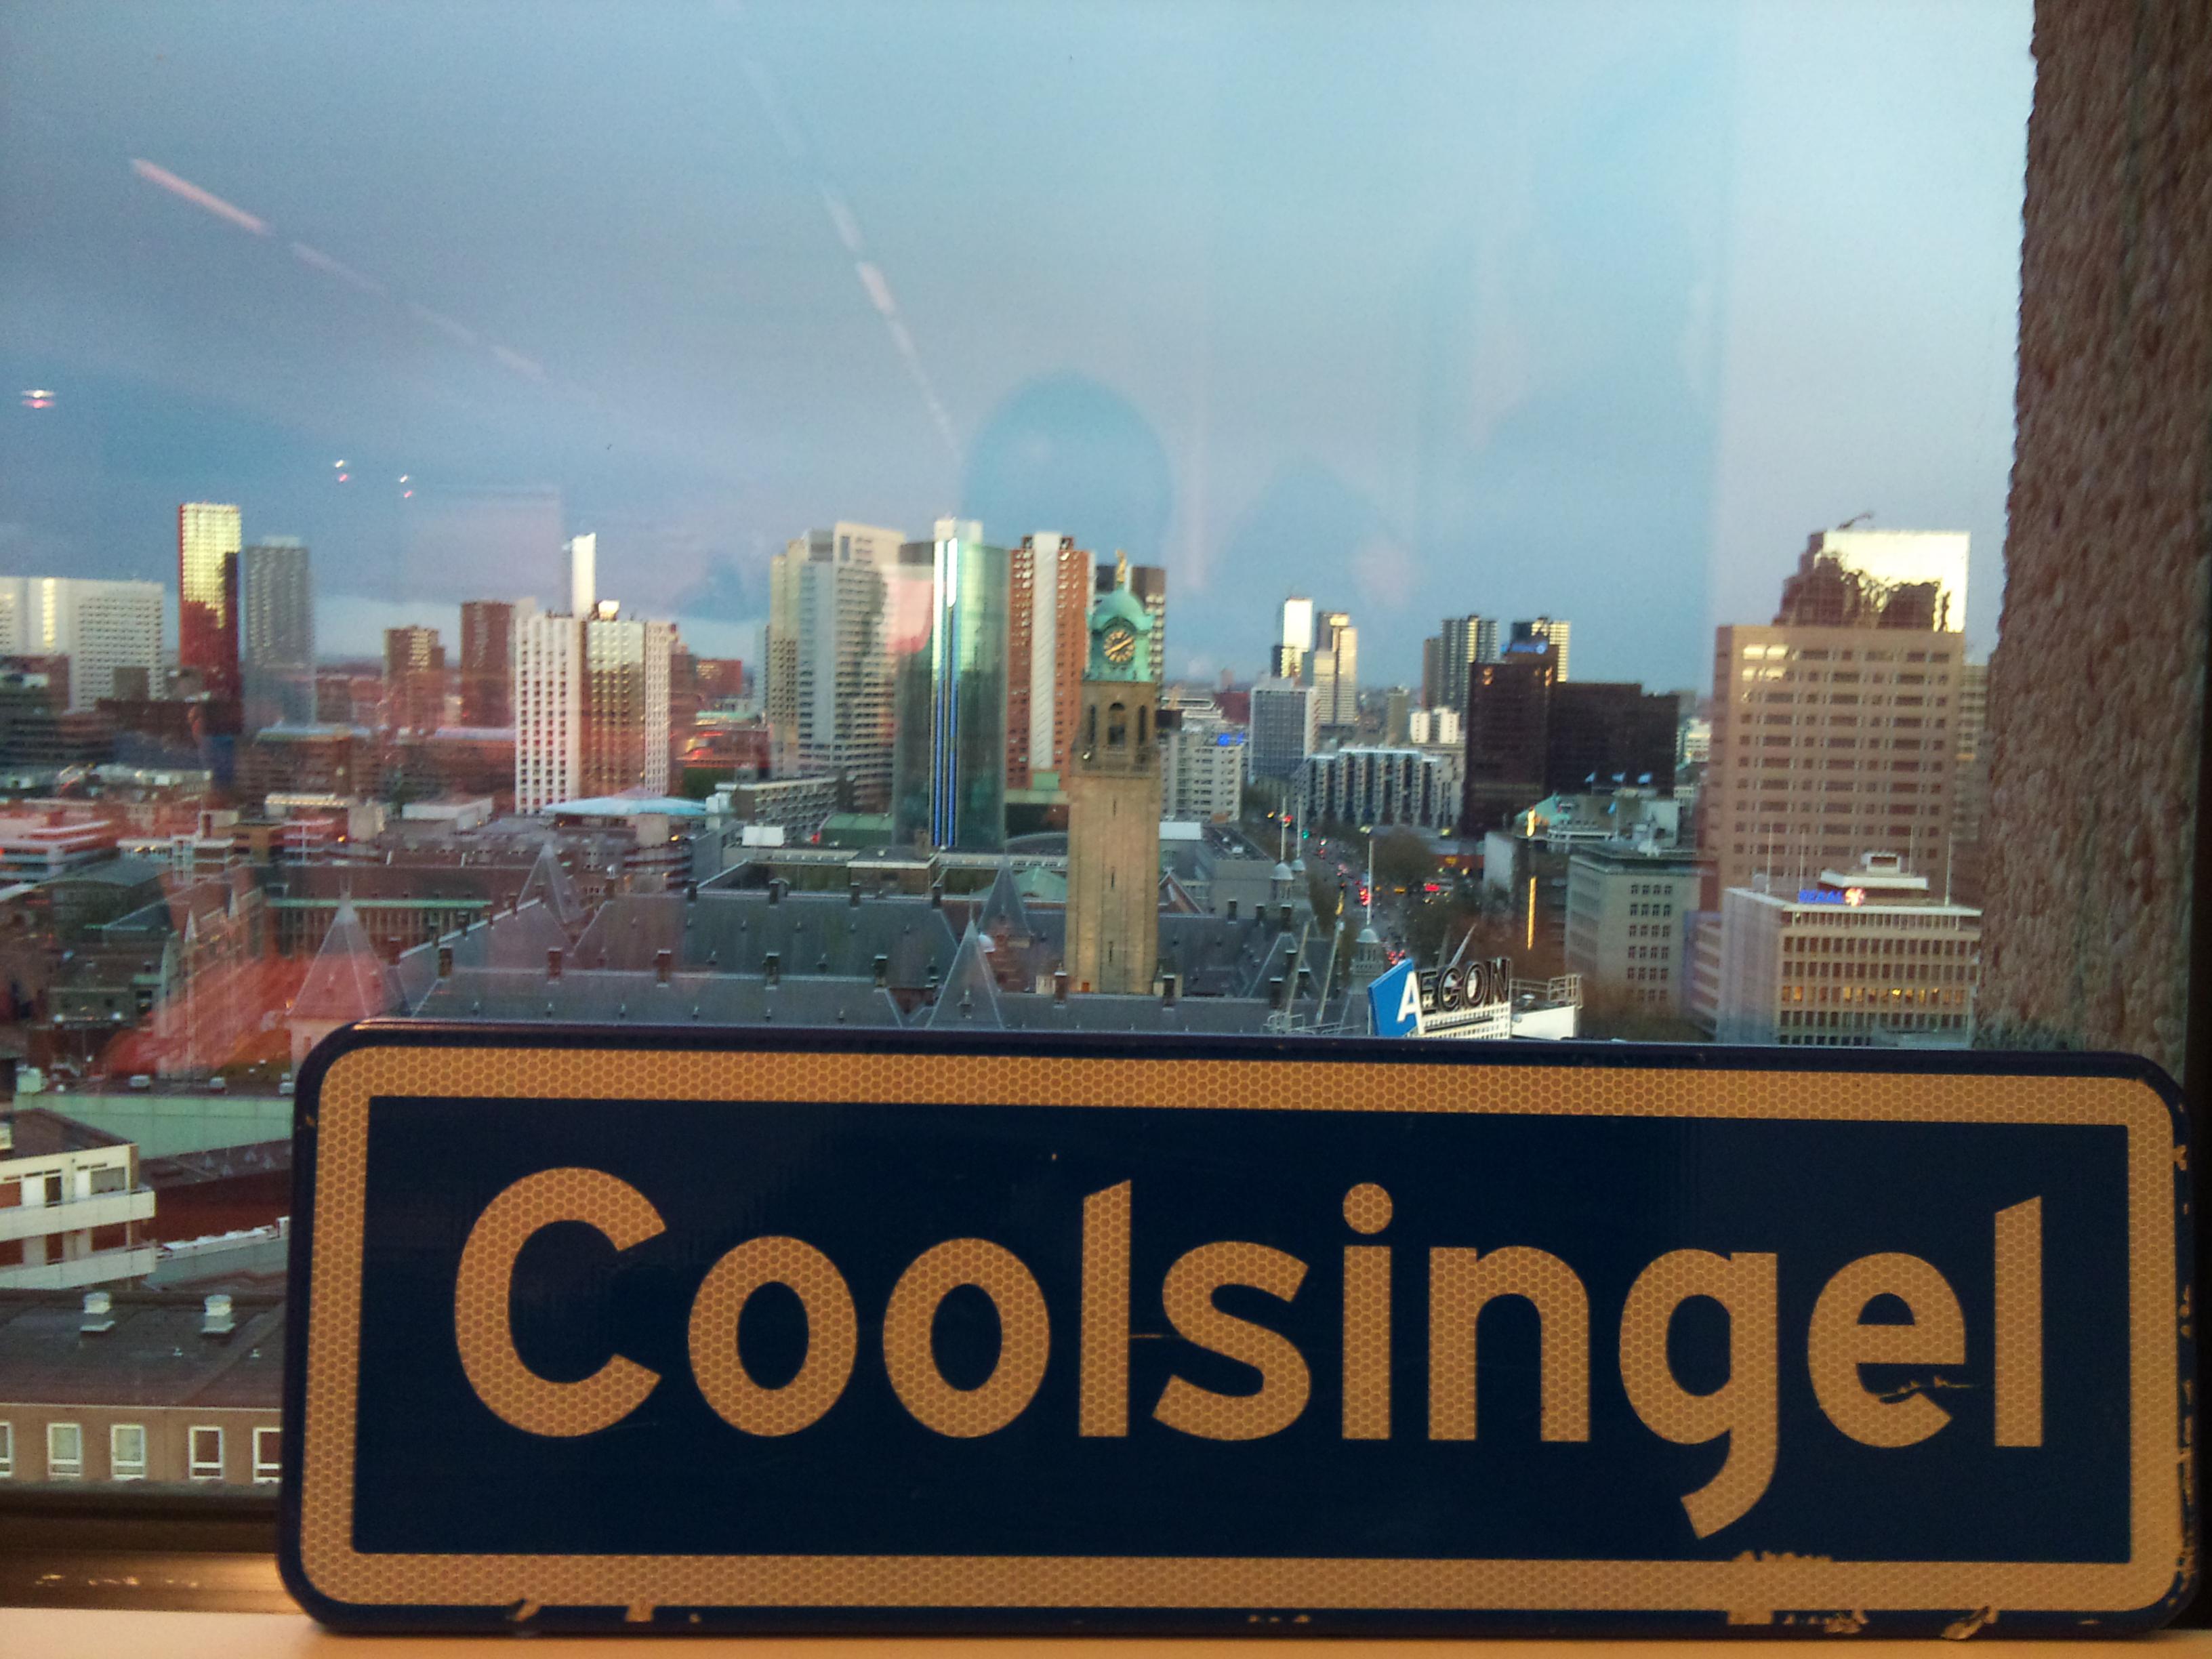 Coolsingel